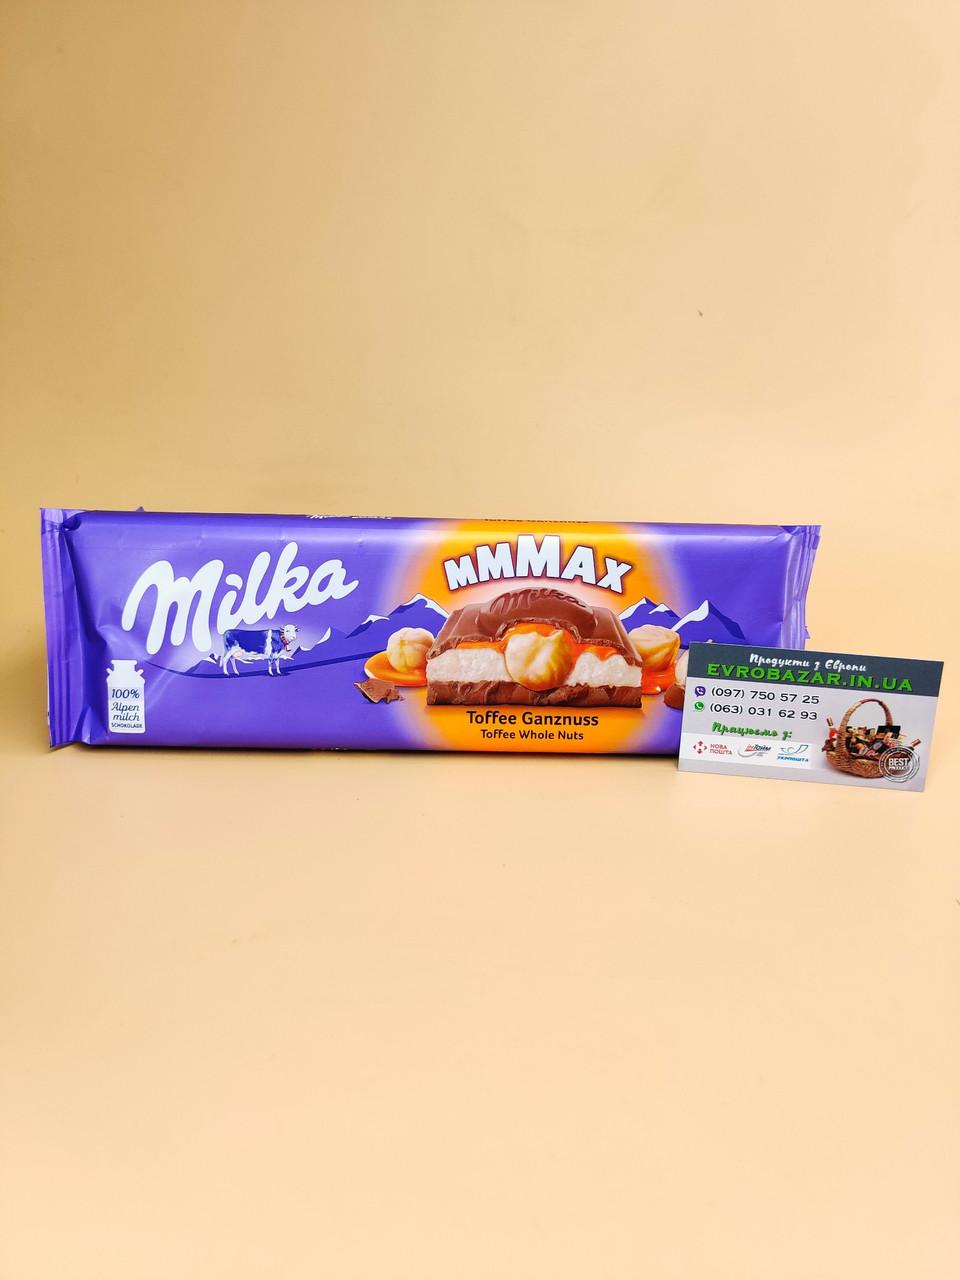 Milka max toffee ganznuss